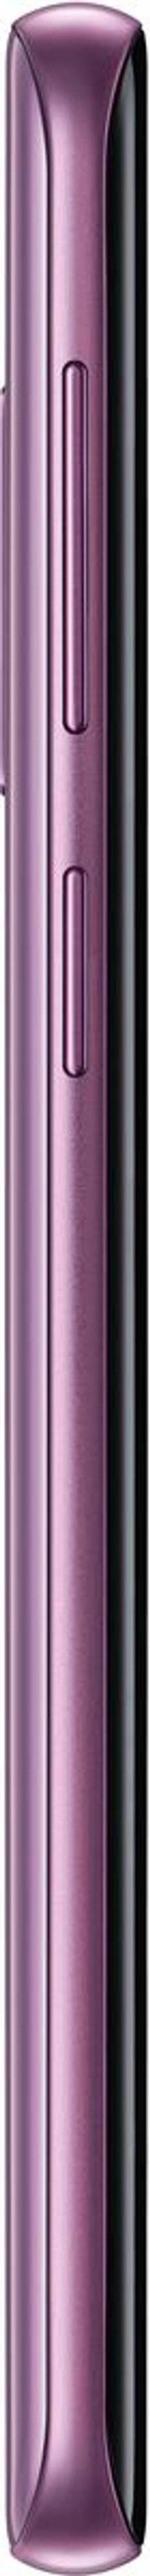 Galaxy S9 64GB Lilac Purple